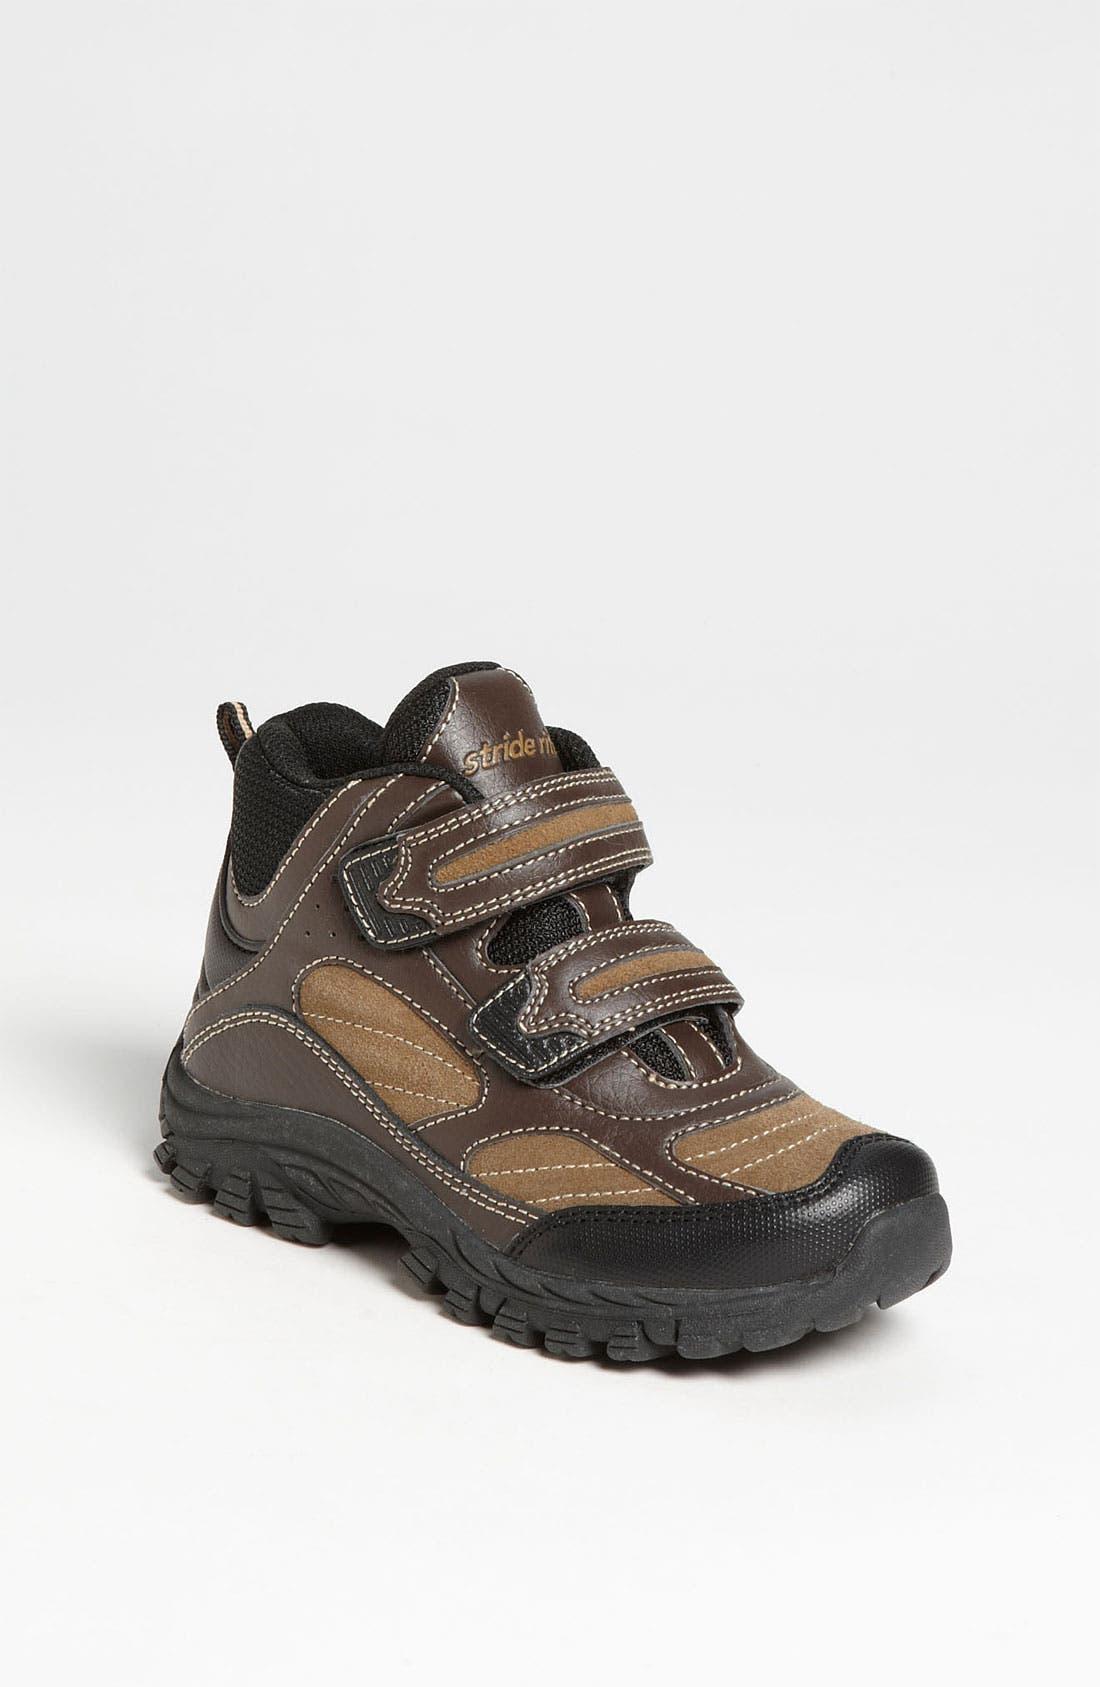 Main Image - Stride Rite 'Ritchie' Boot (Walker, Toddler & Little Kid)